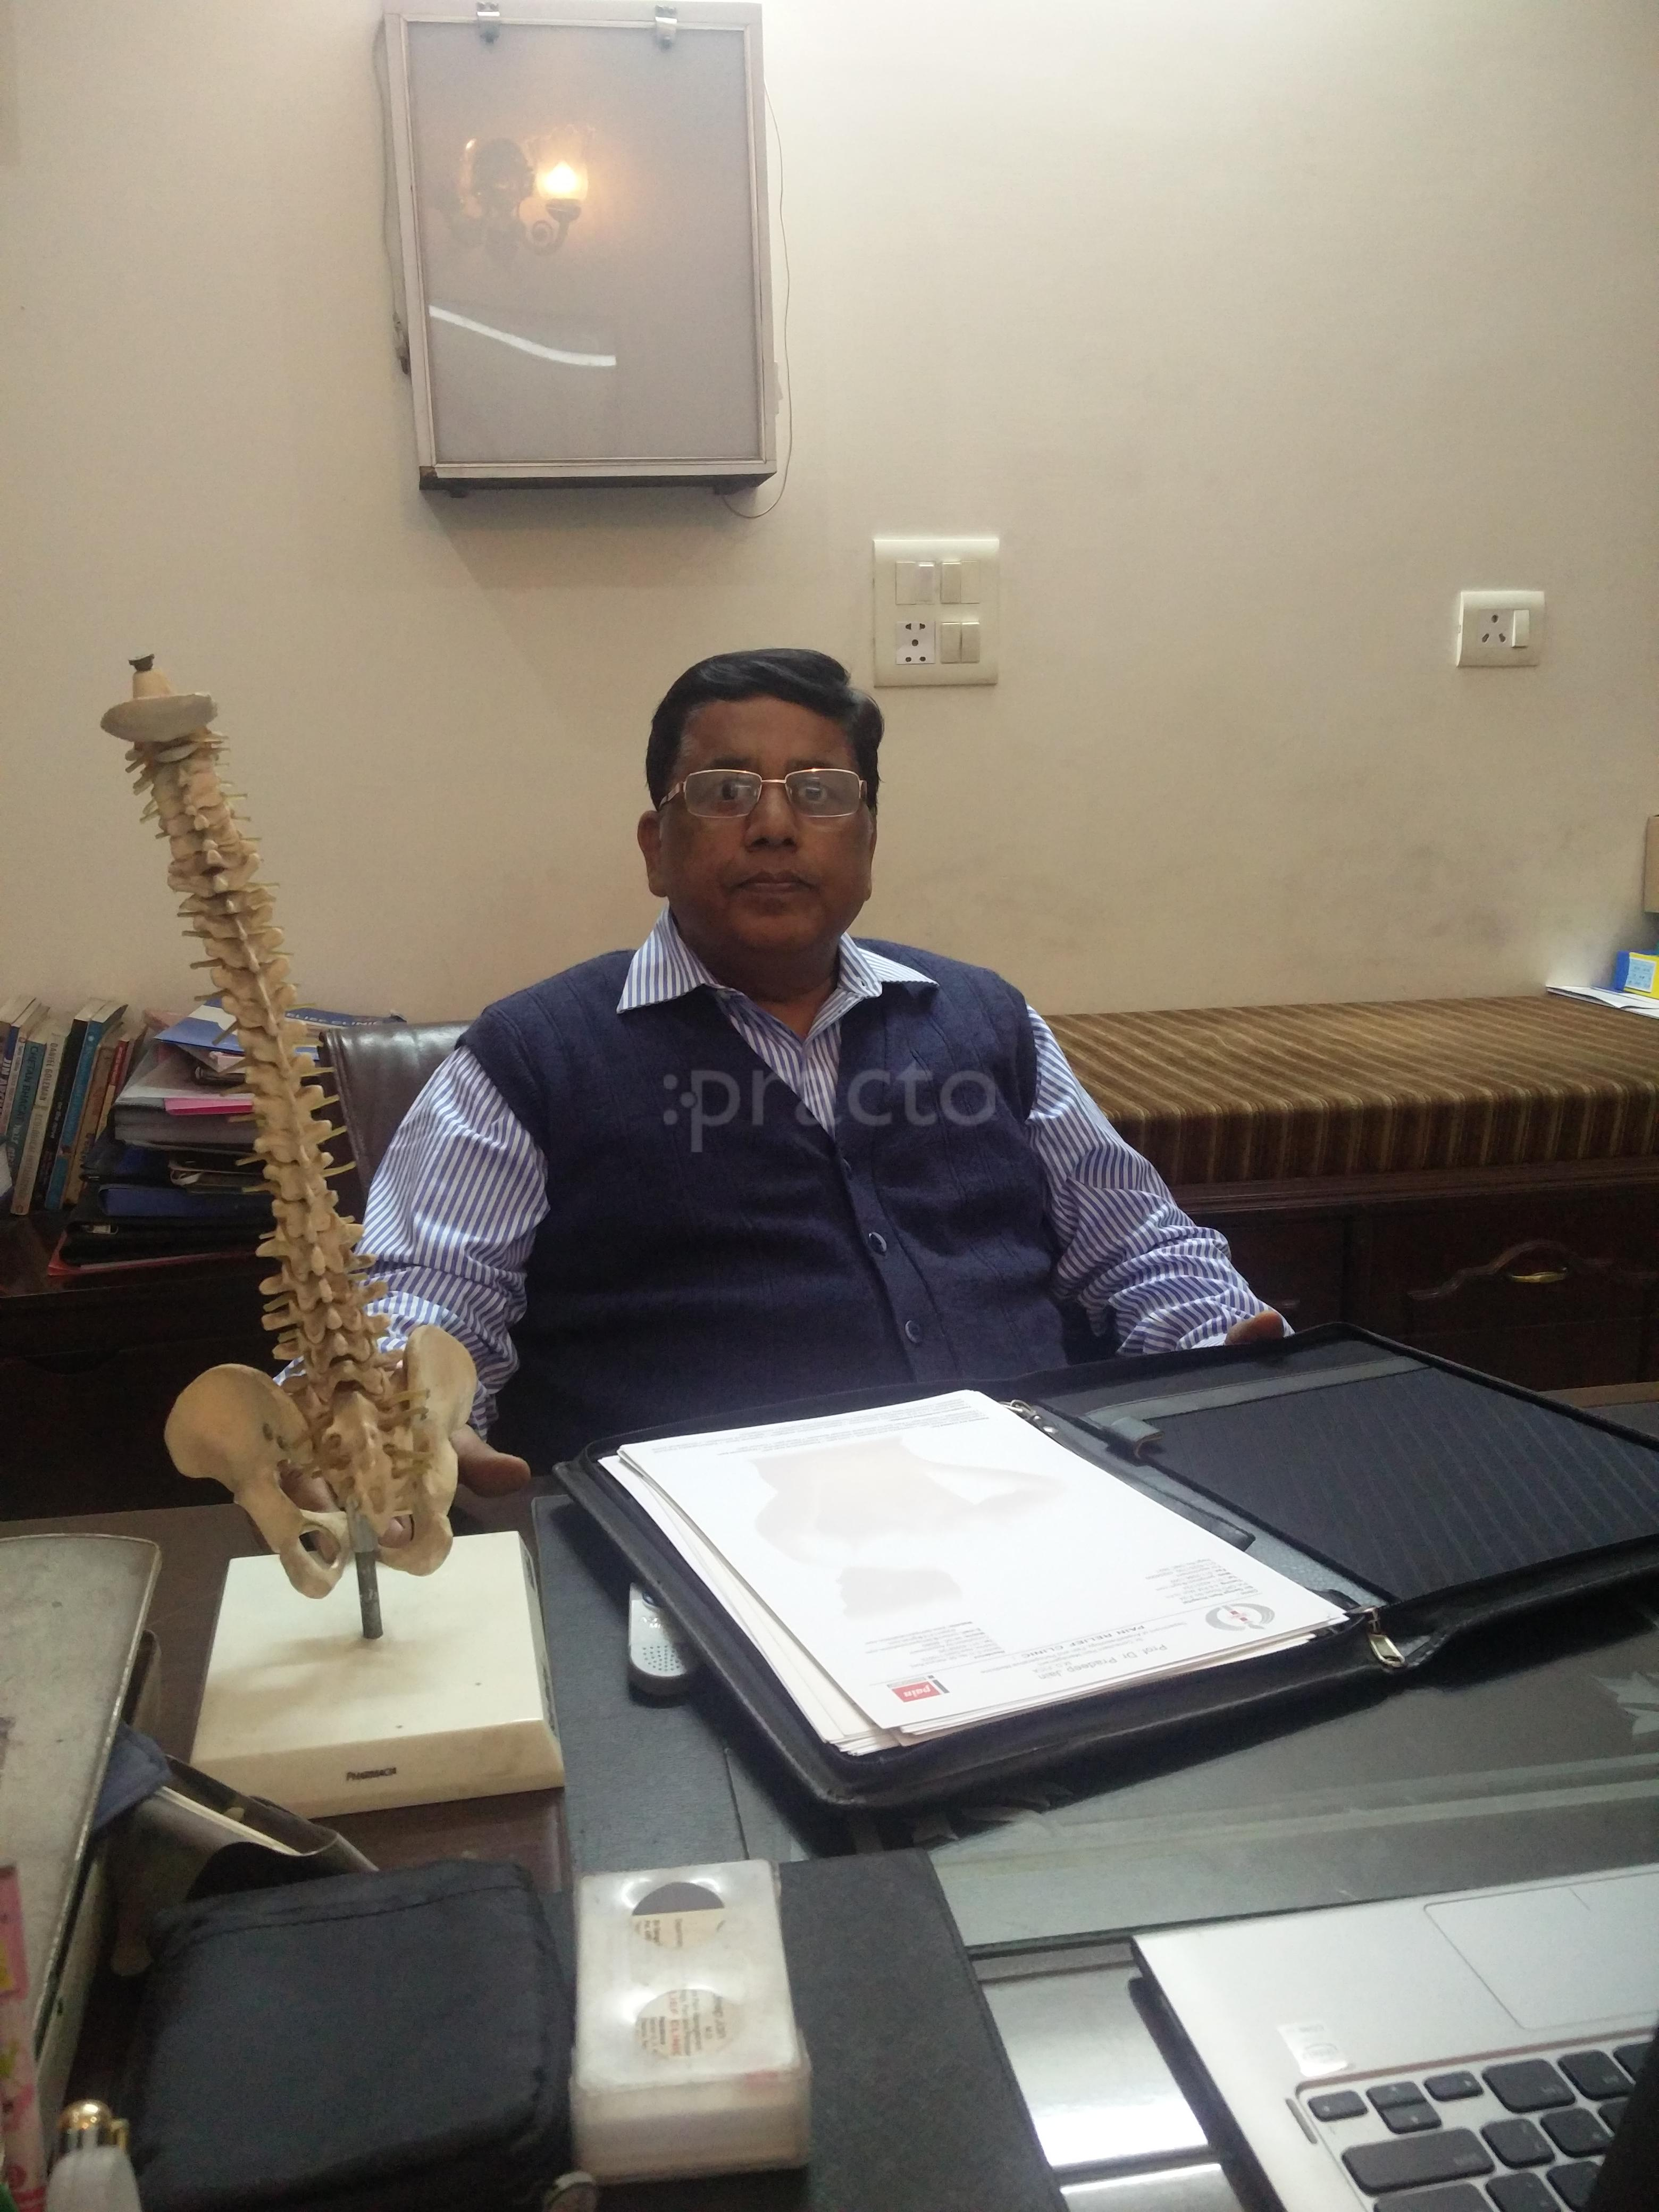 dr pradeep jain book appointment online view fees feedbacks dr pradeep jain book appointment online view fees feedbacks practo